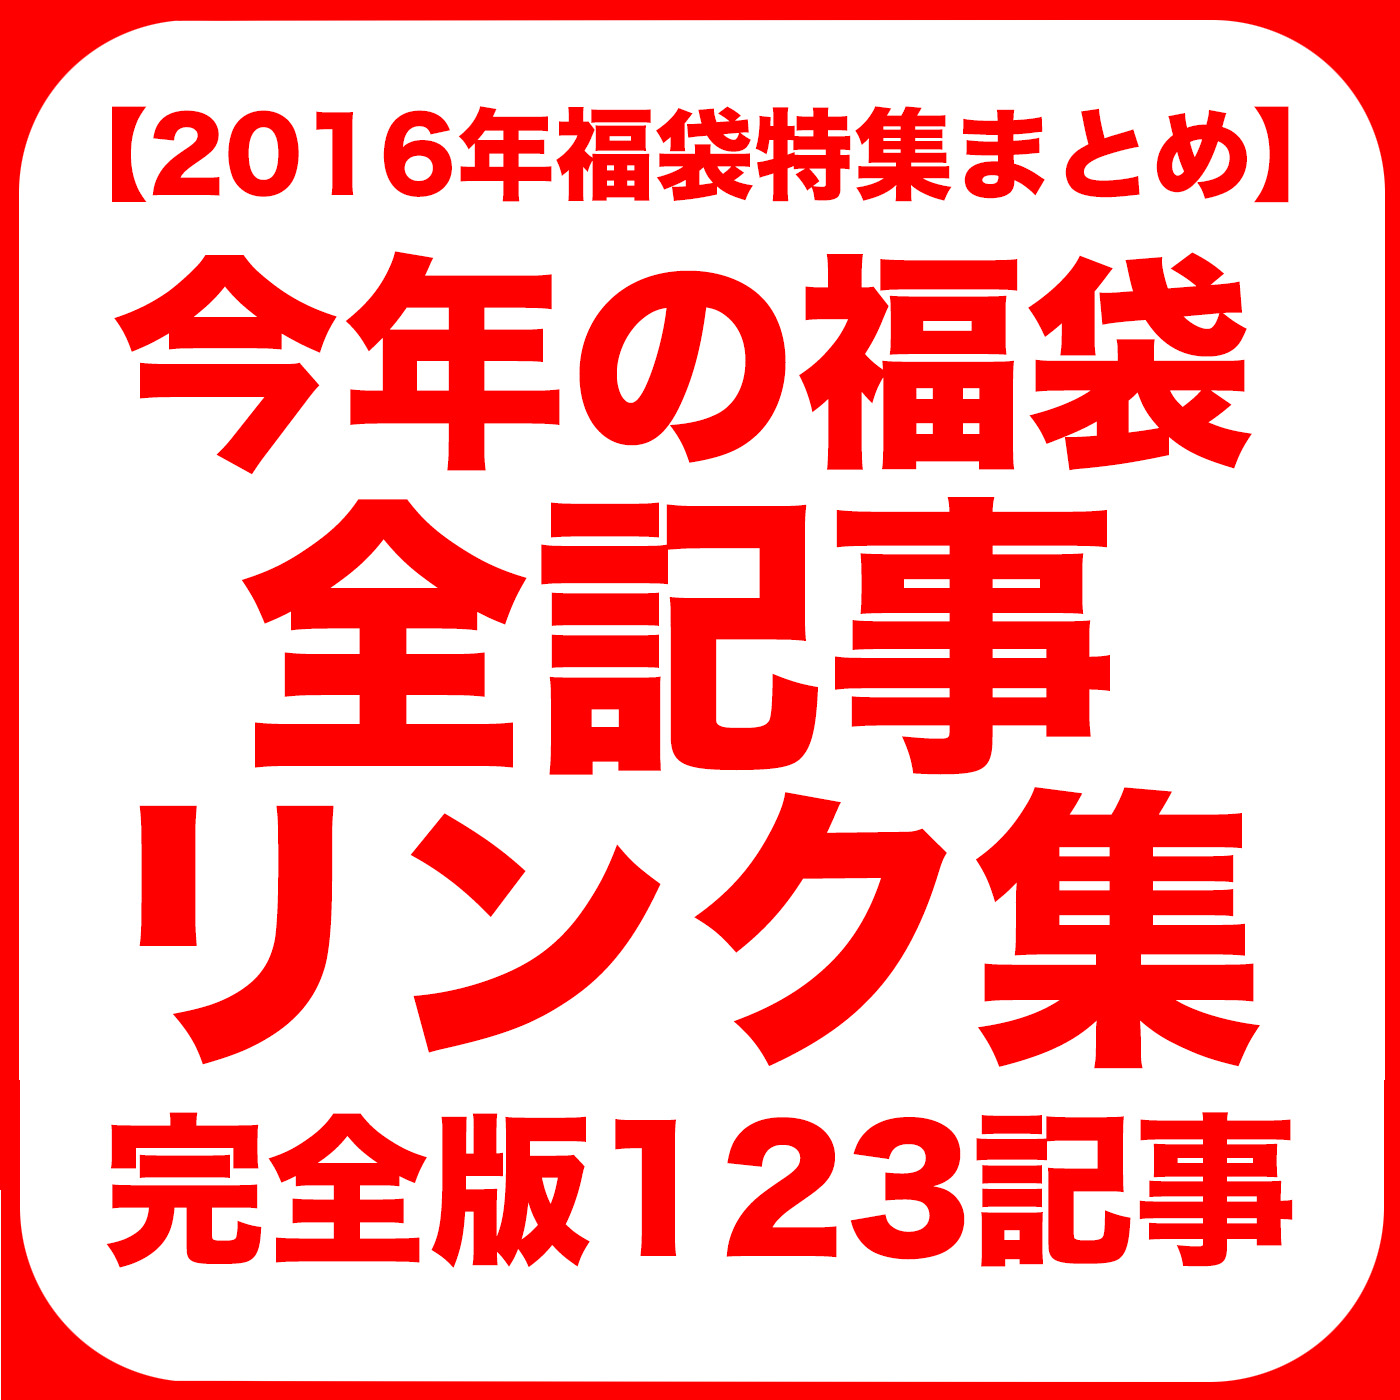 2016zenkiji